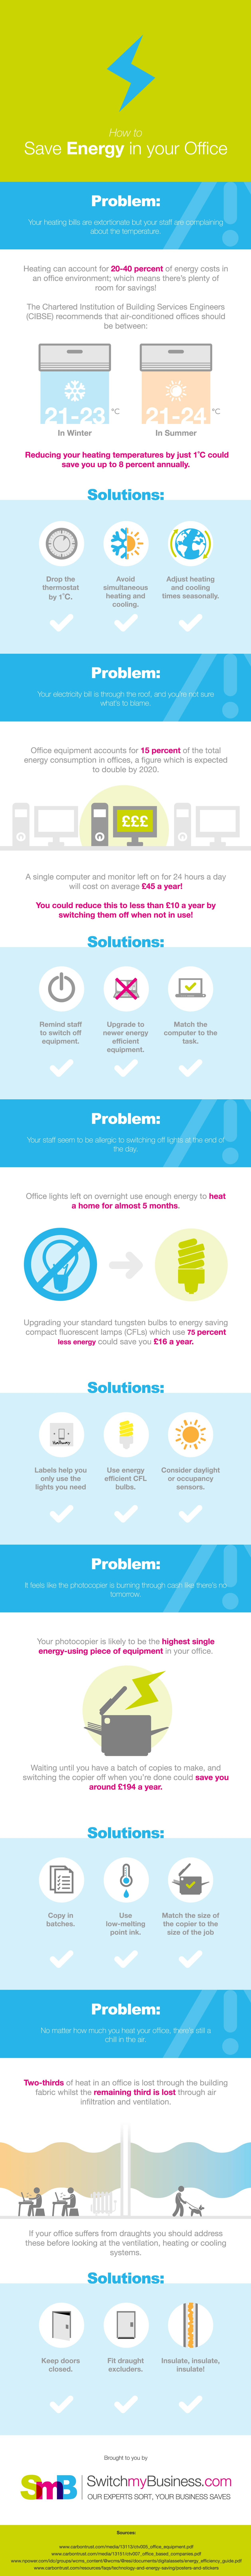 Office Energy Saving Advice